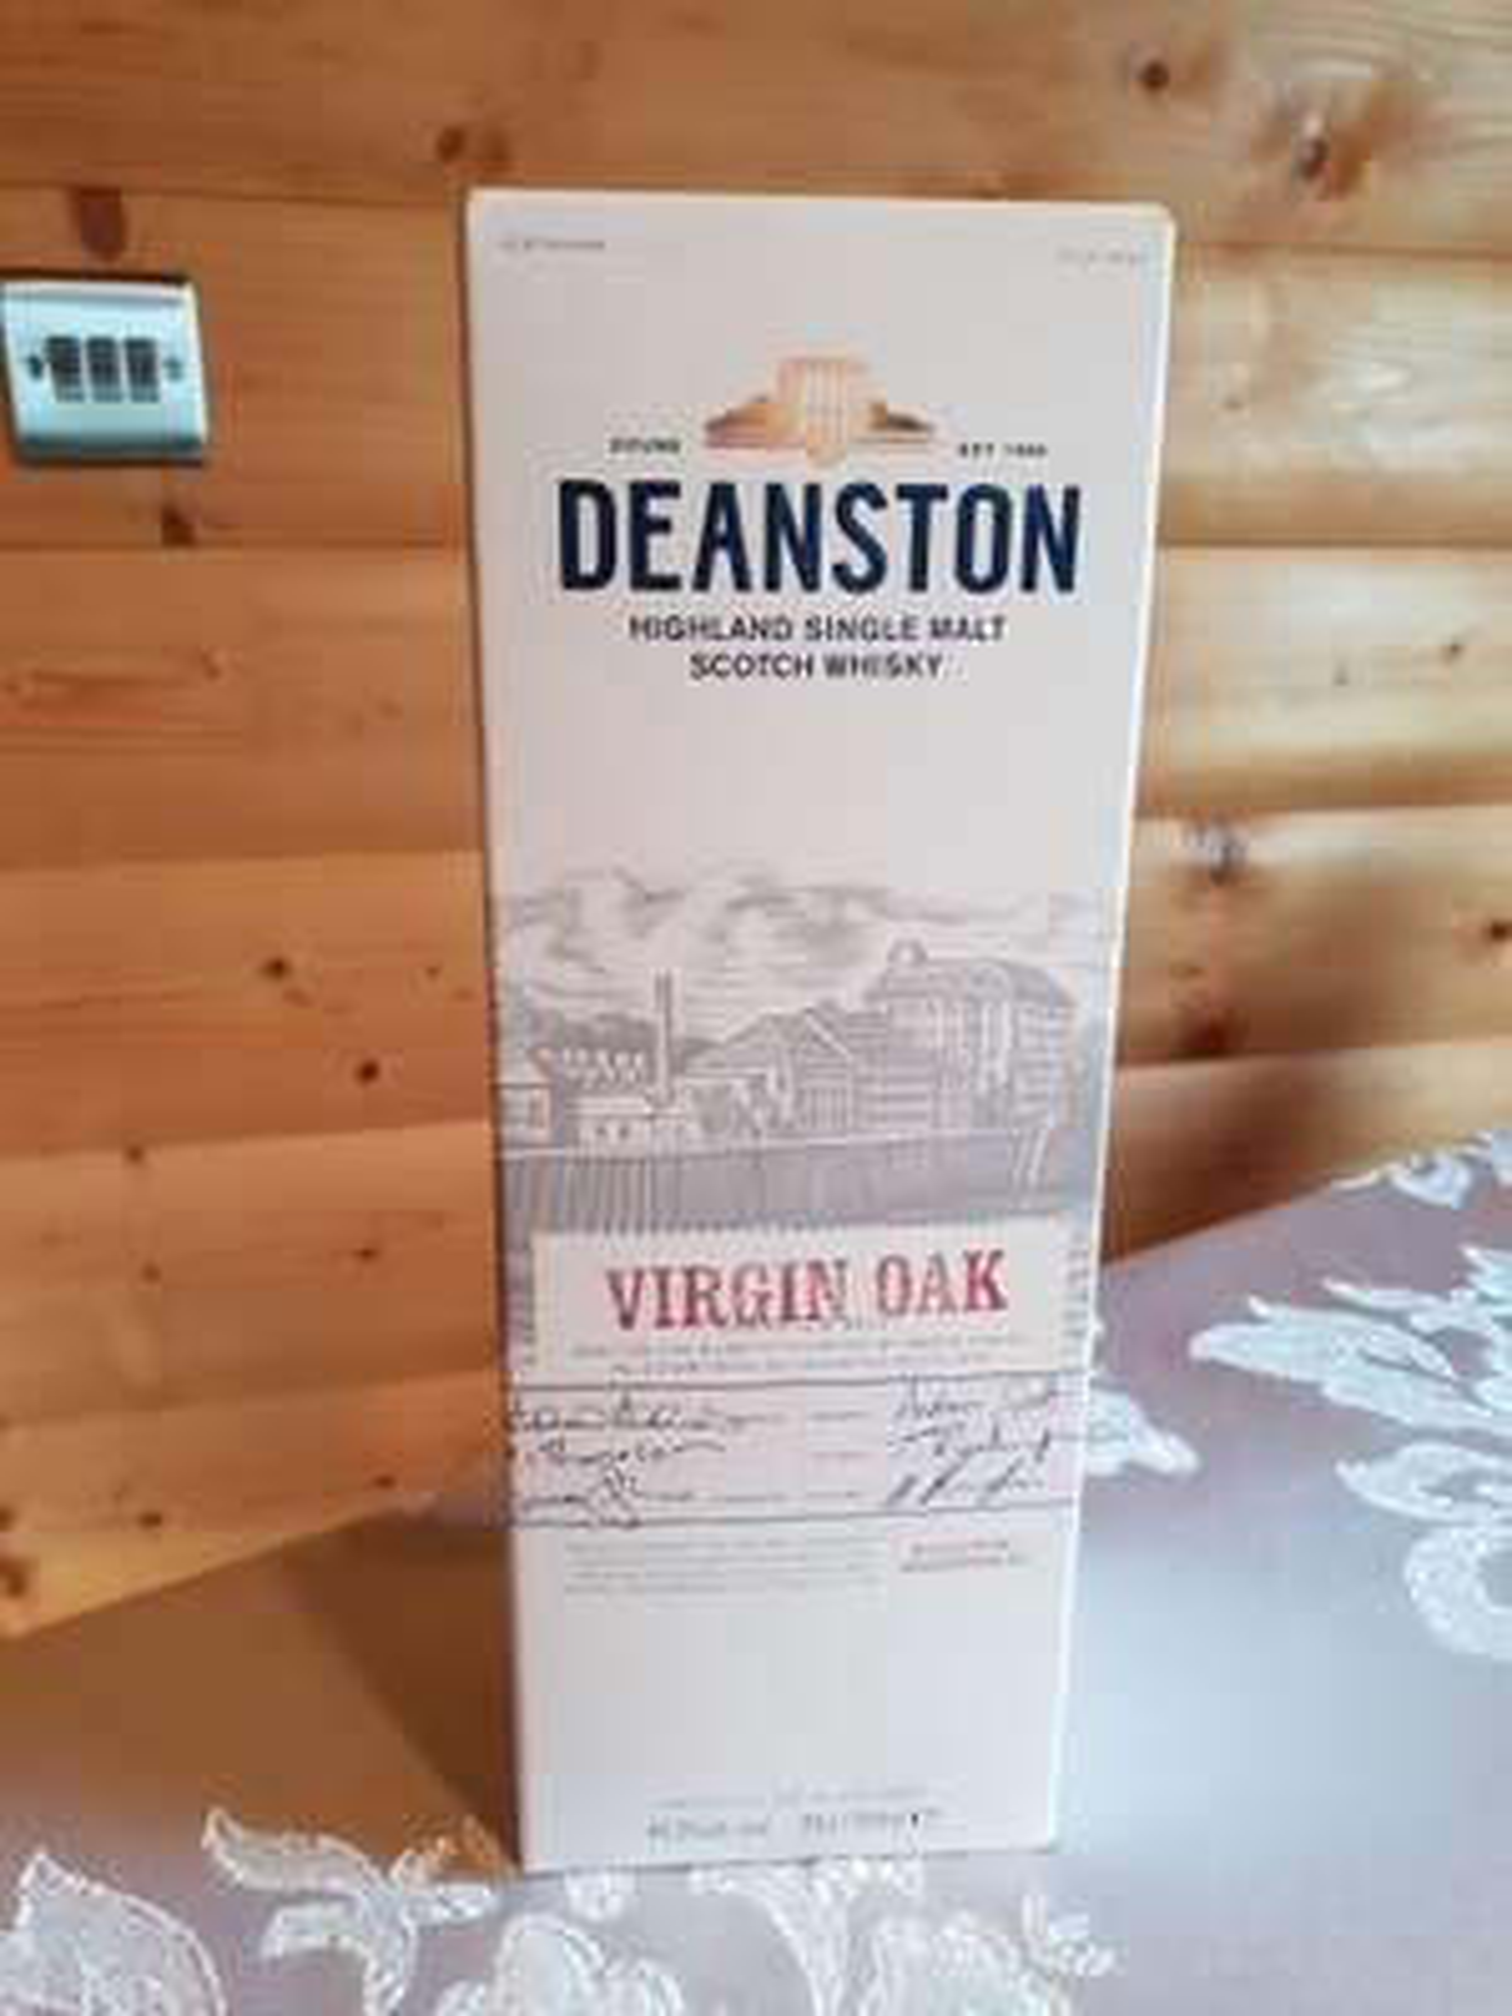 Deanston Virgin Oak 70cl Single Malt Scotch Whisky £25 instore @ Booths